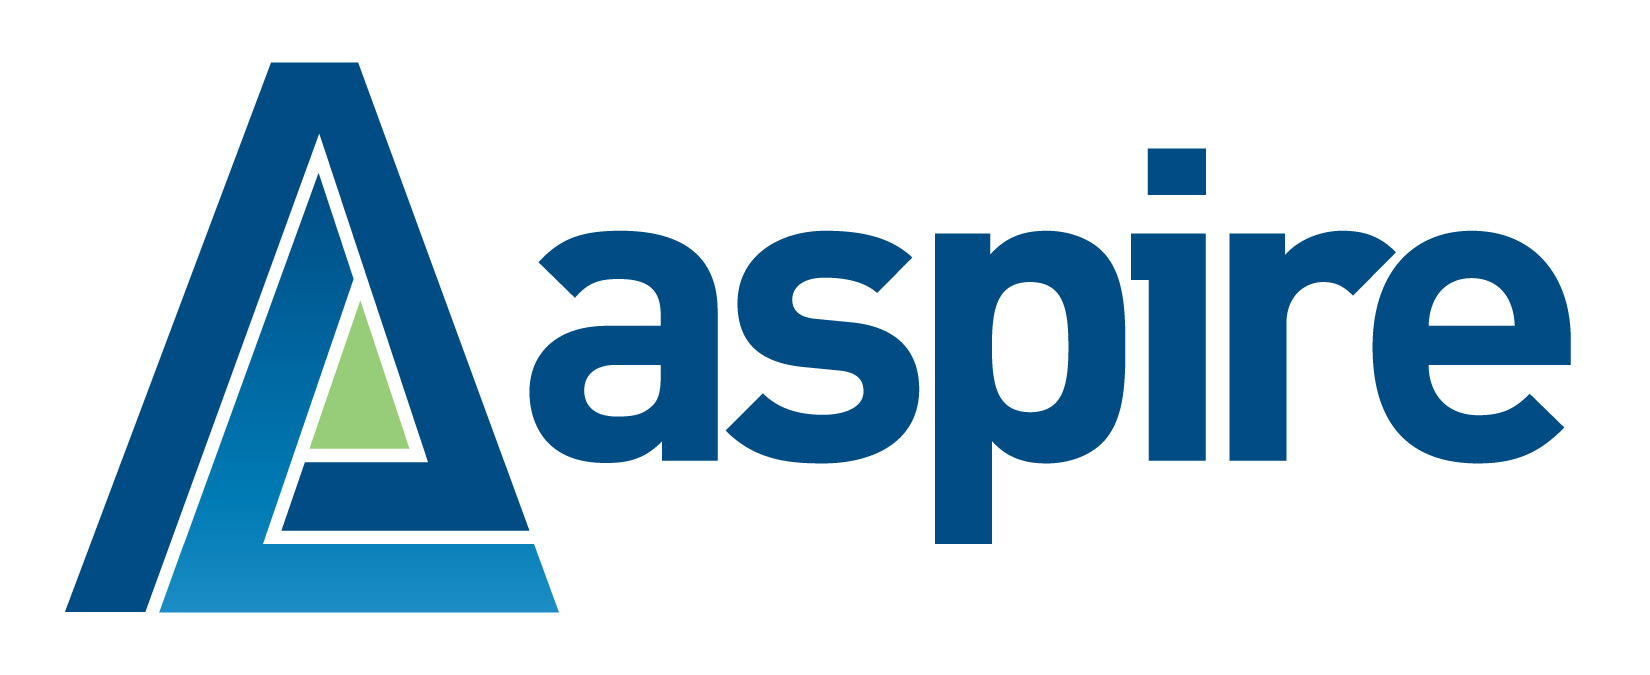 Greenpath Insurance in California Rebrands as Aspire  Greenpath Insur...